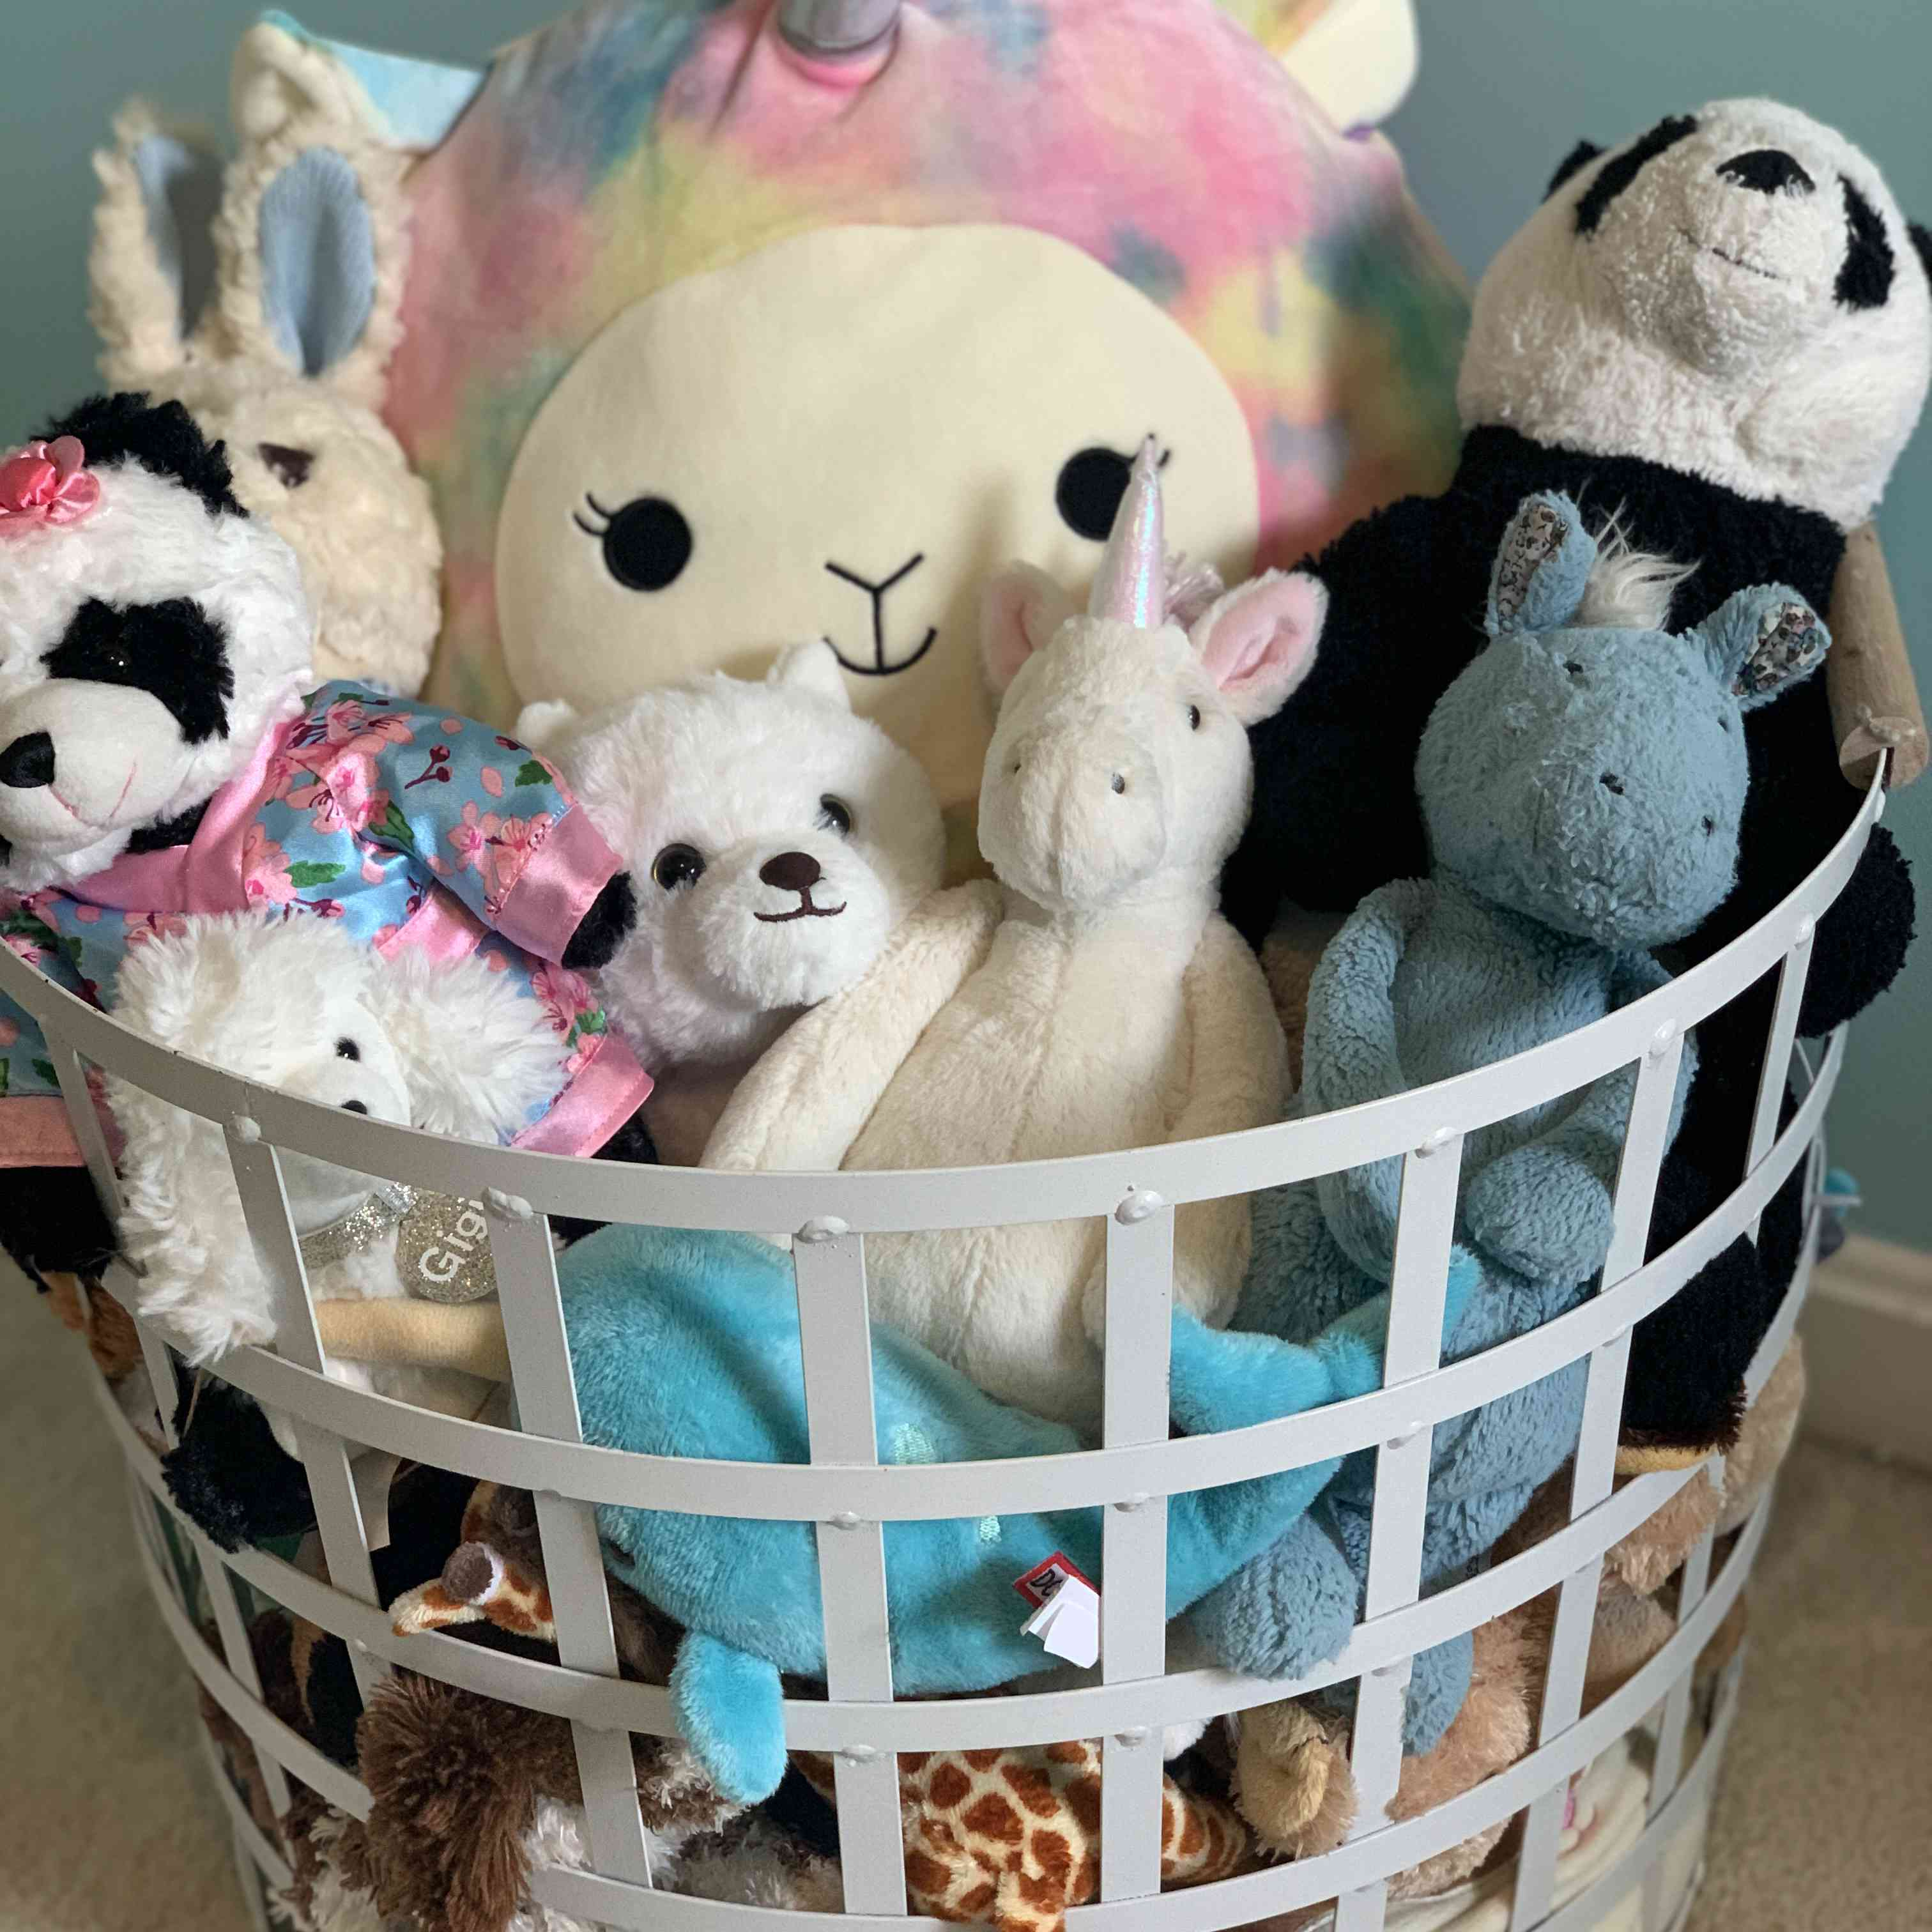 Sorage basket full of stuffed toy animals